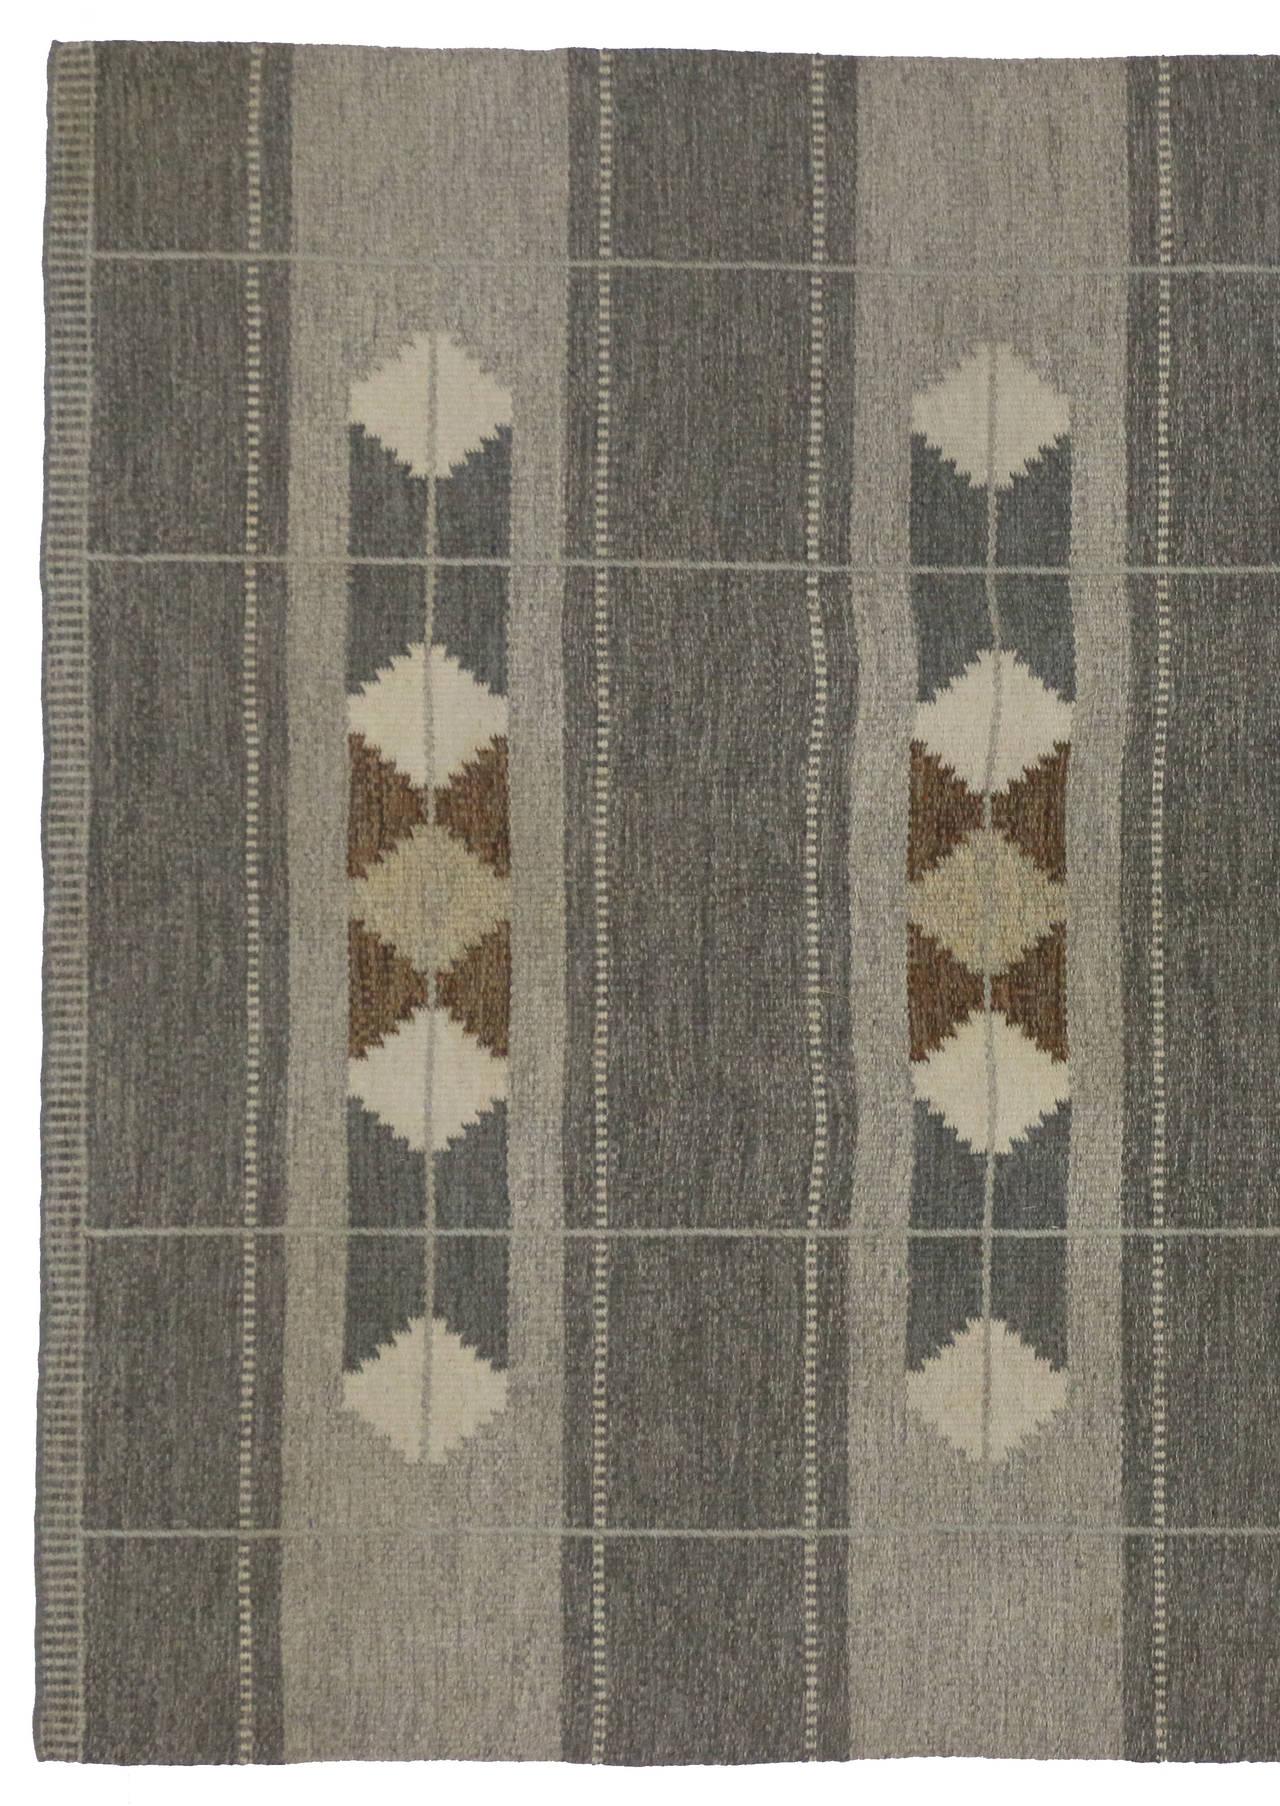 Wool Vintage Swedish Rollakan Gray Kilim Rug with Scandinavian Modern Style For Sale